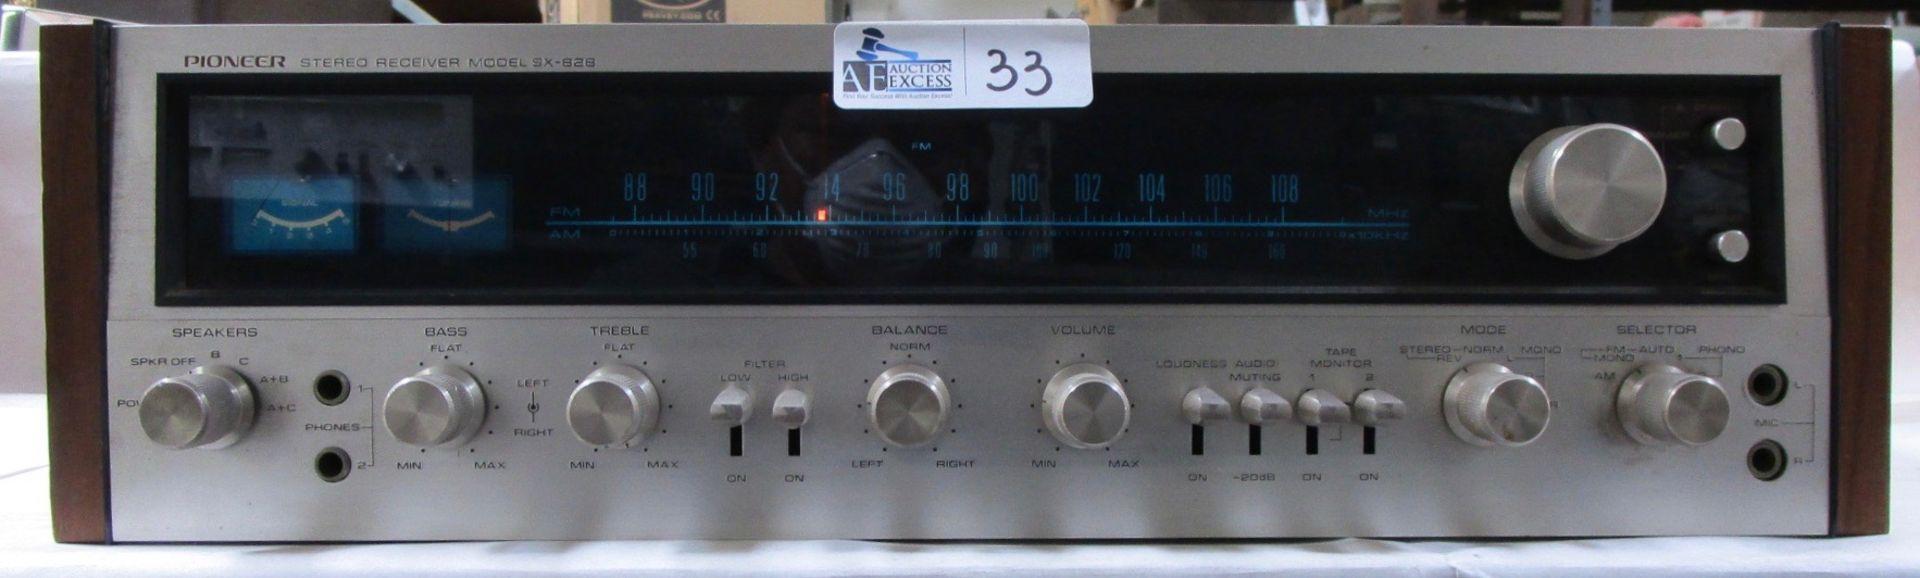 Lot 33 - PIONEER SX-828